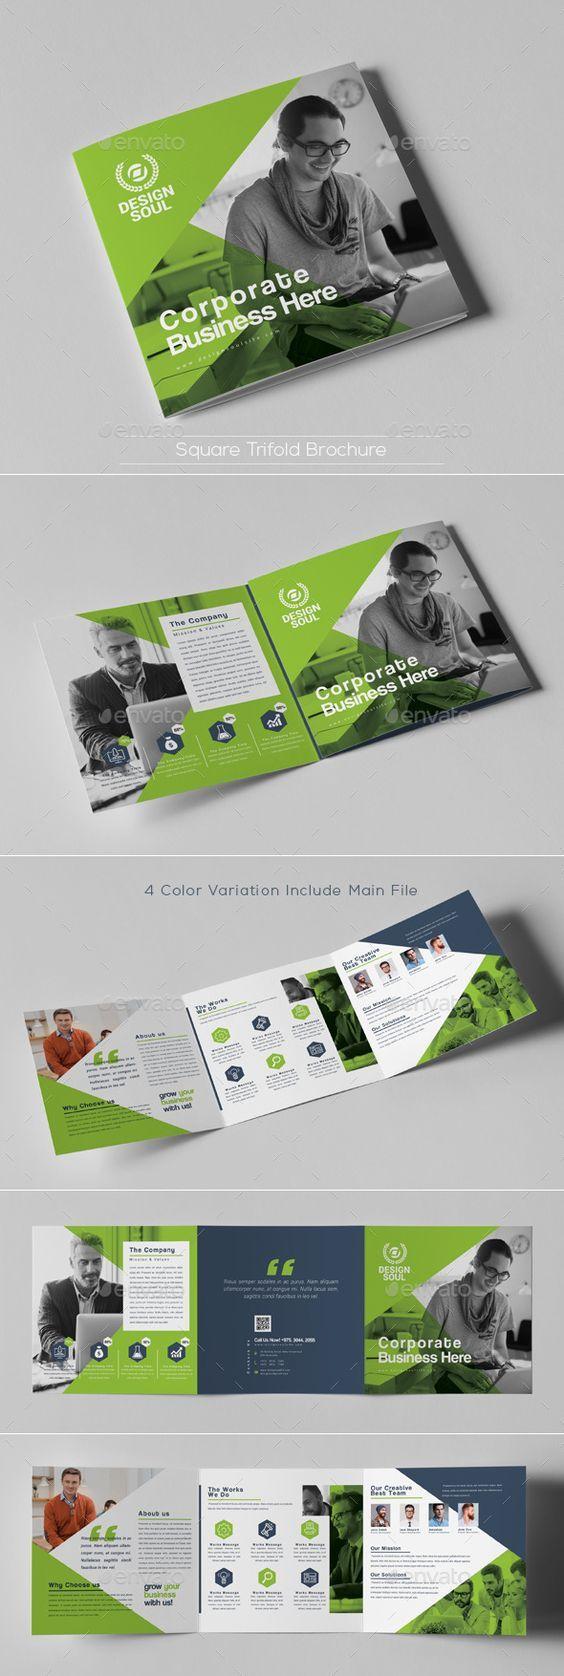 Brochur Design #BrochurDesign#CatalogueDesign#BrochureDesignCompanyIndia#CatalogueDesignAgencyIndia#DesignerPeople